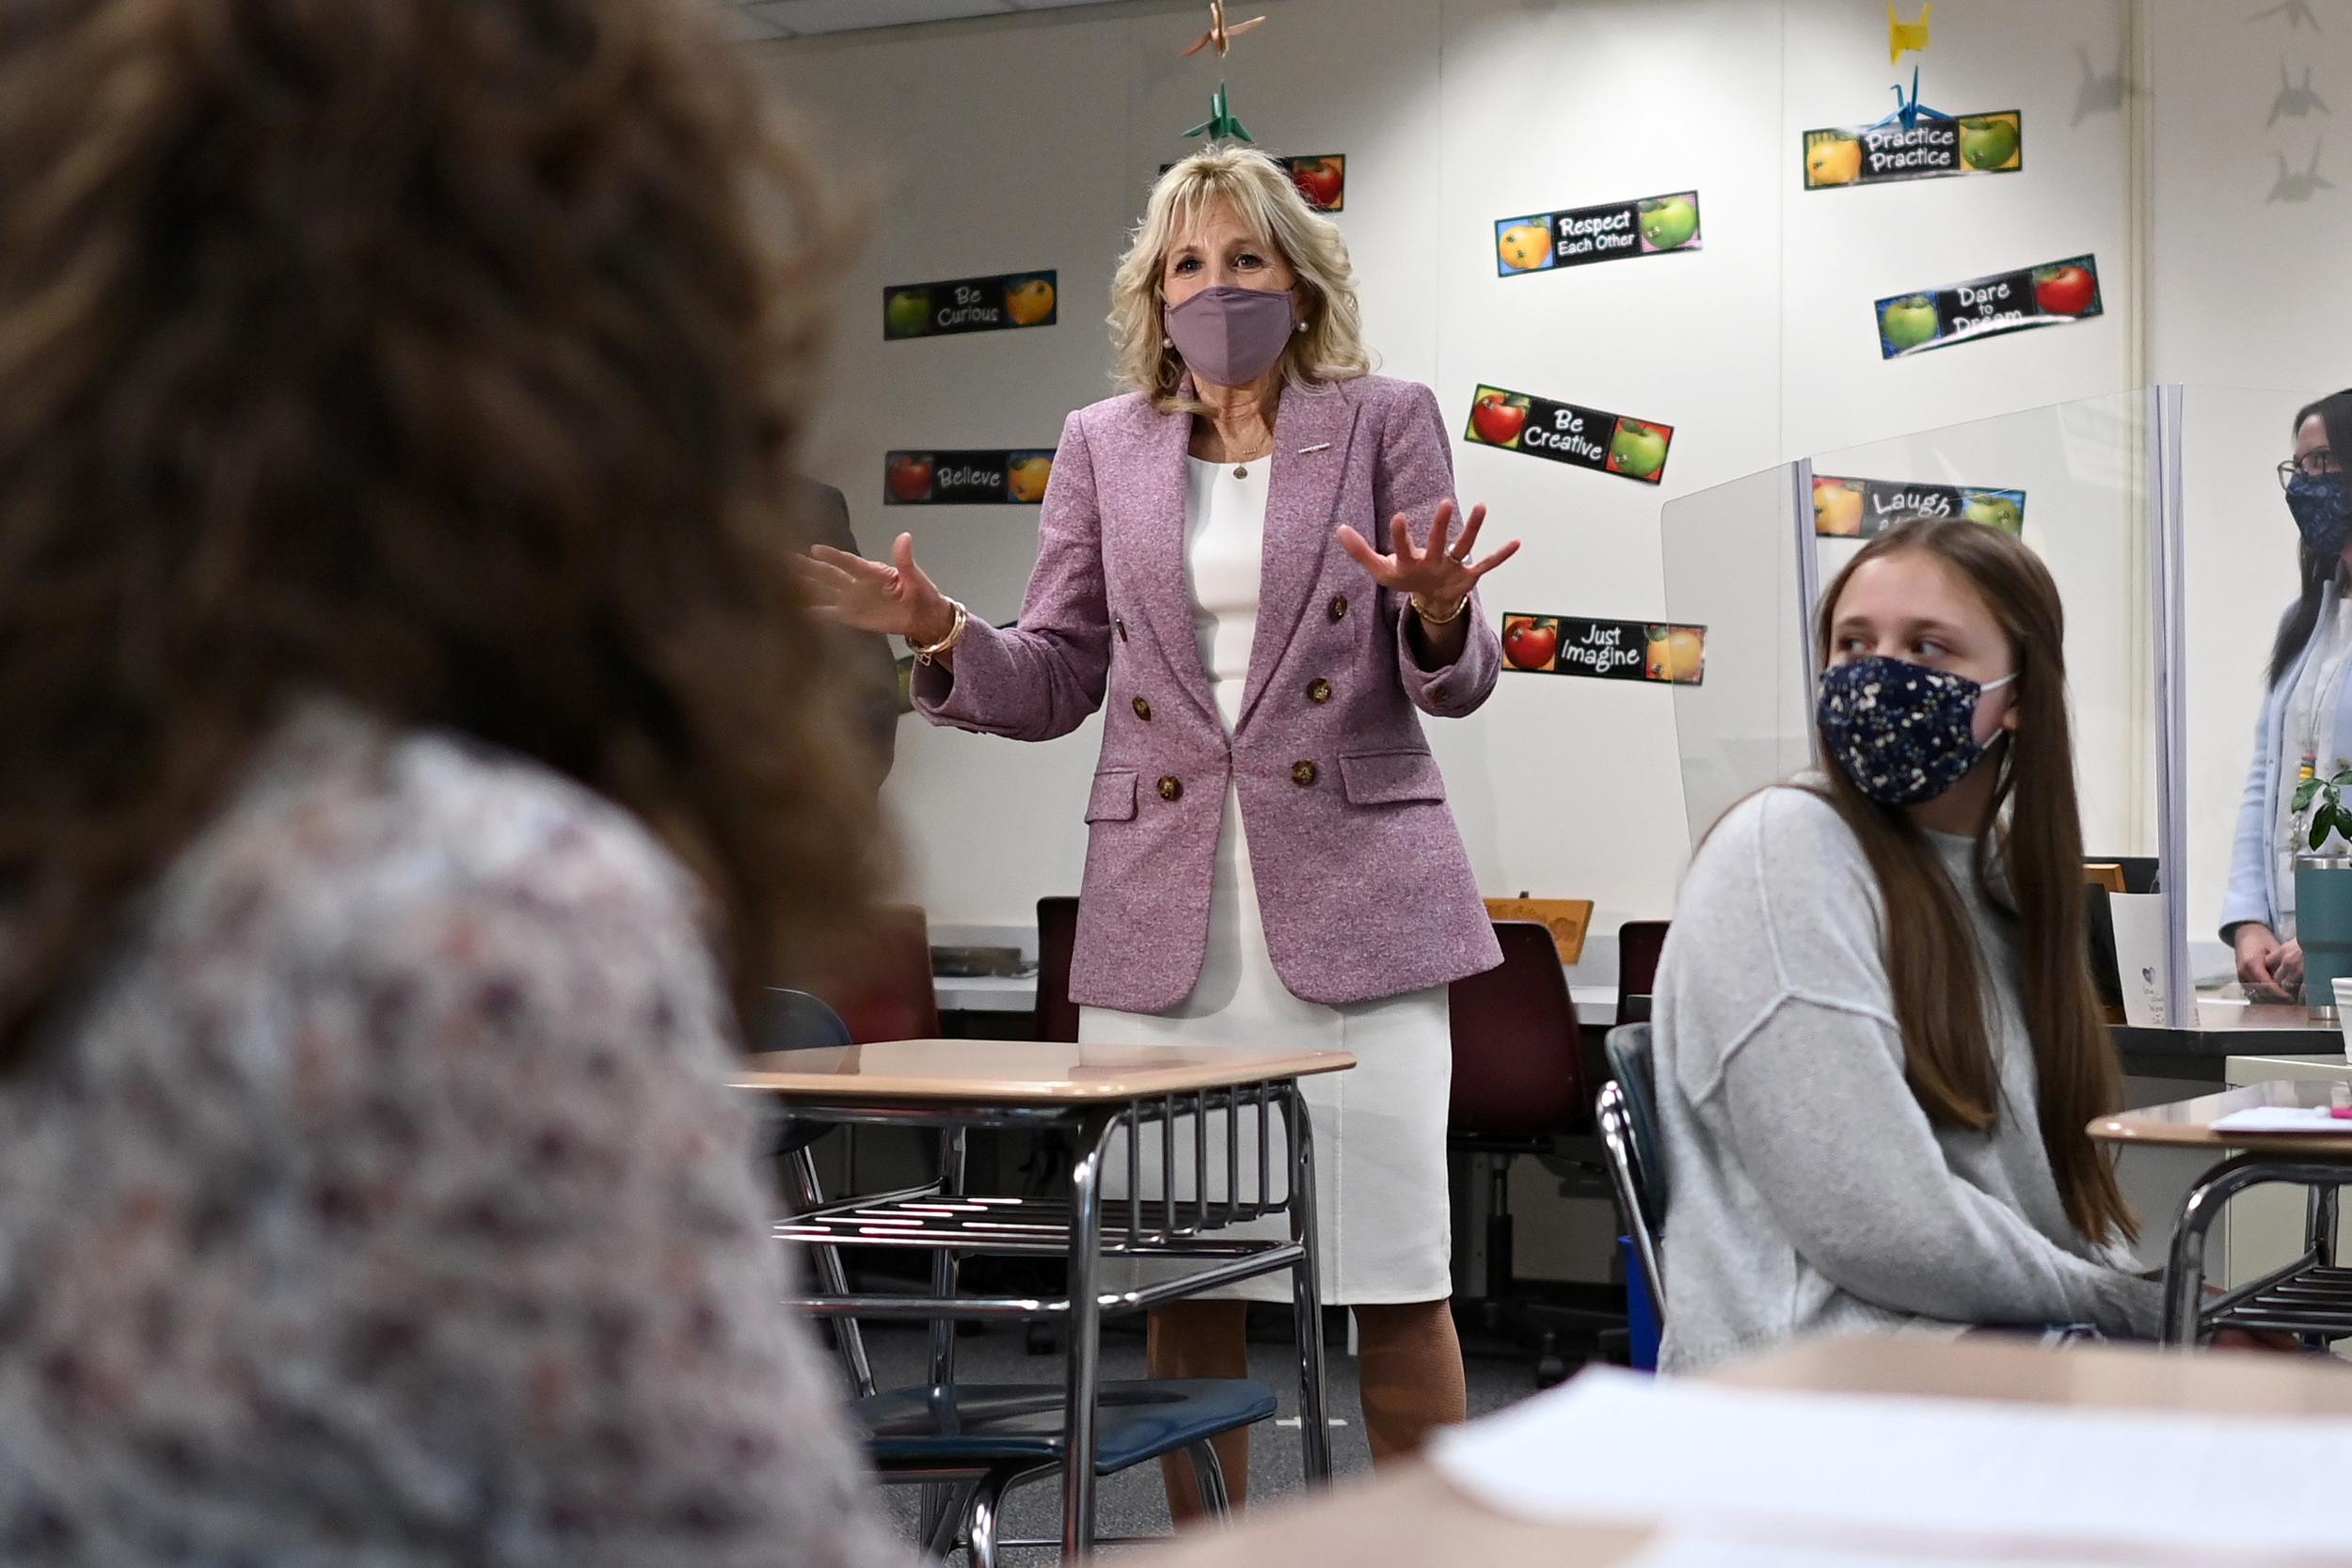 Jill Biden returns to the classroom as a working first lady